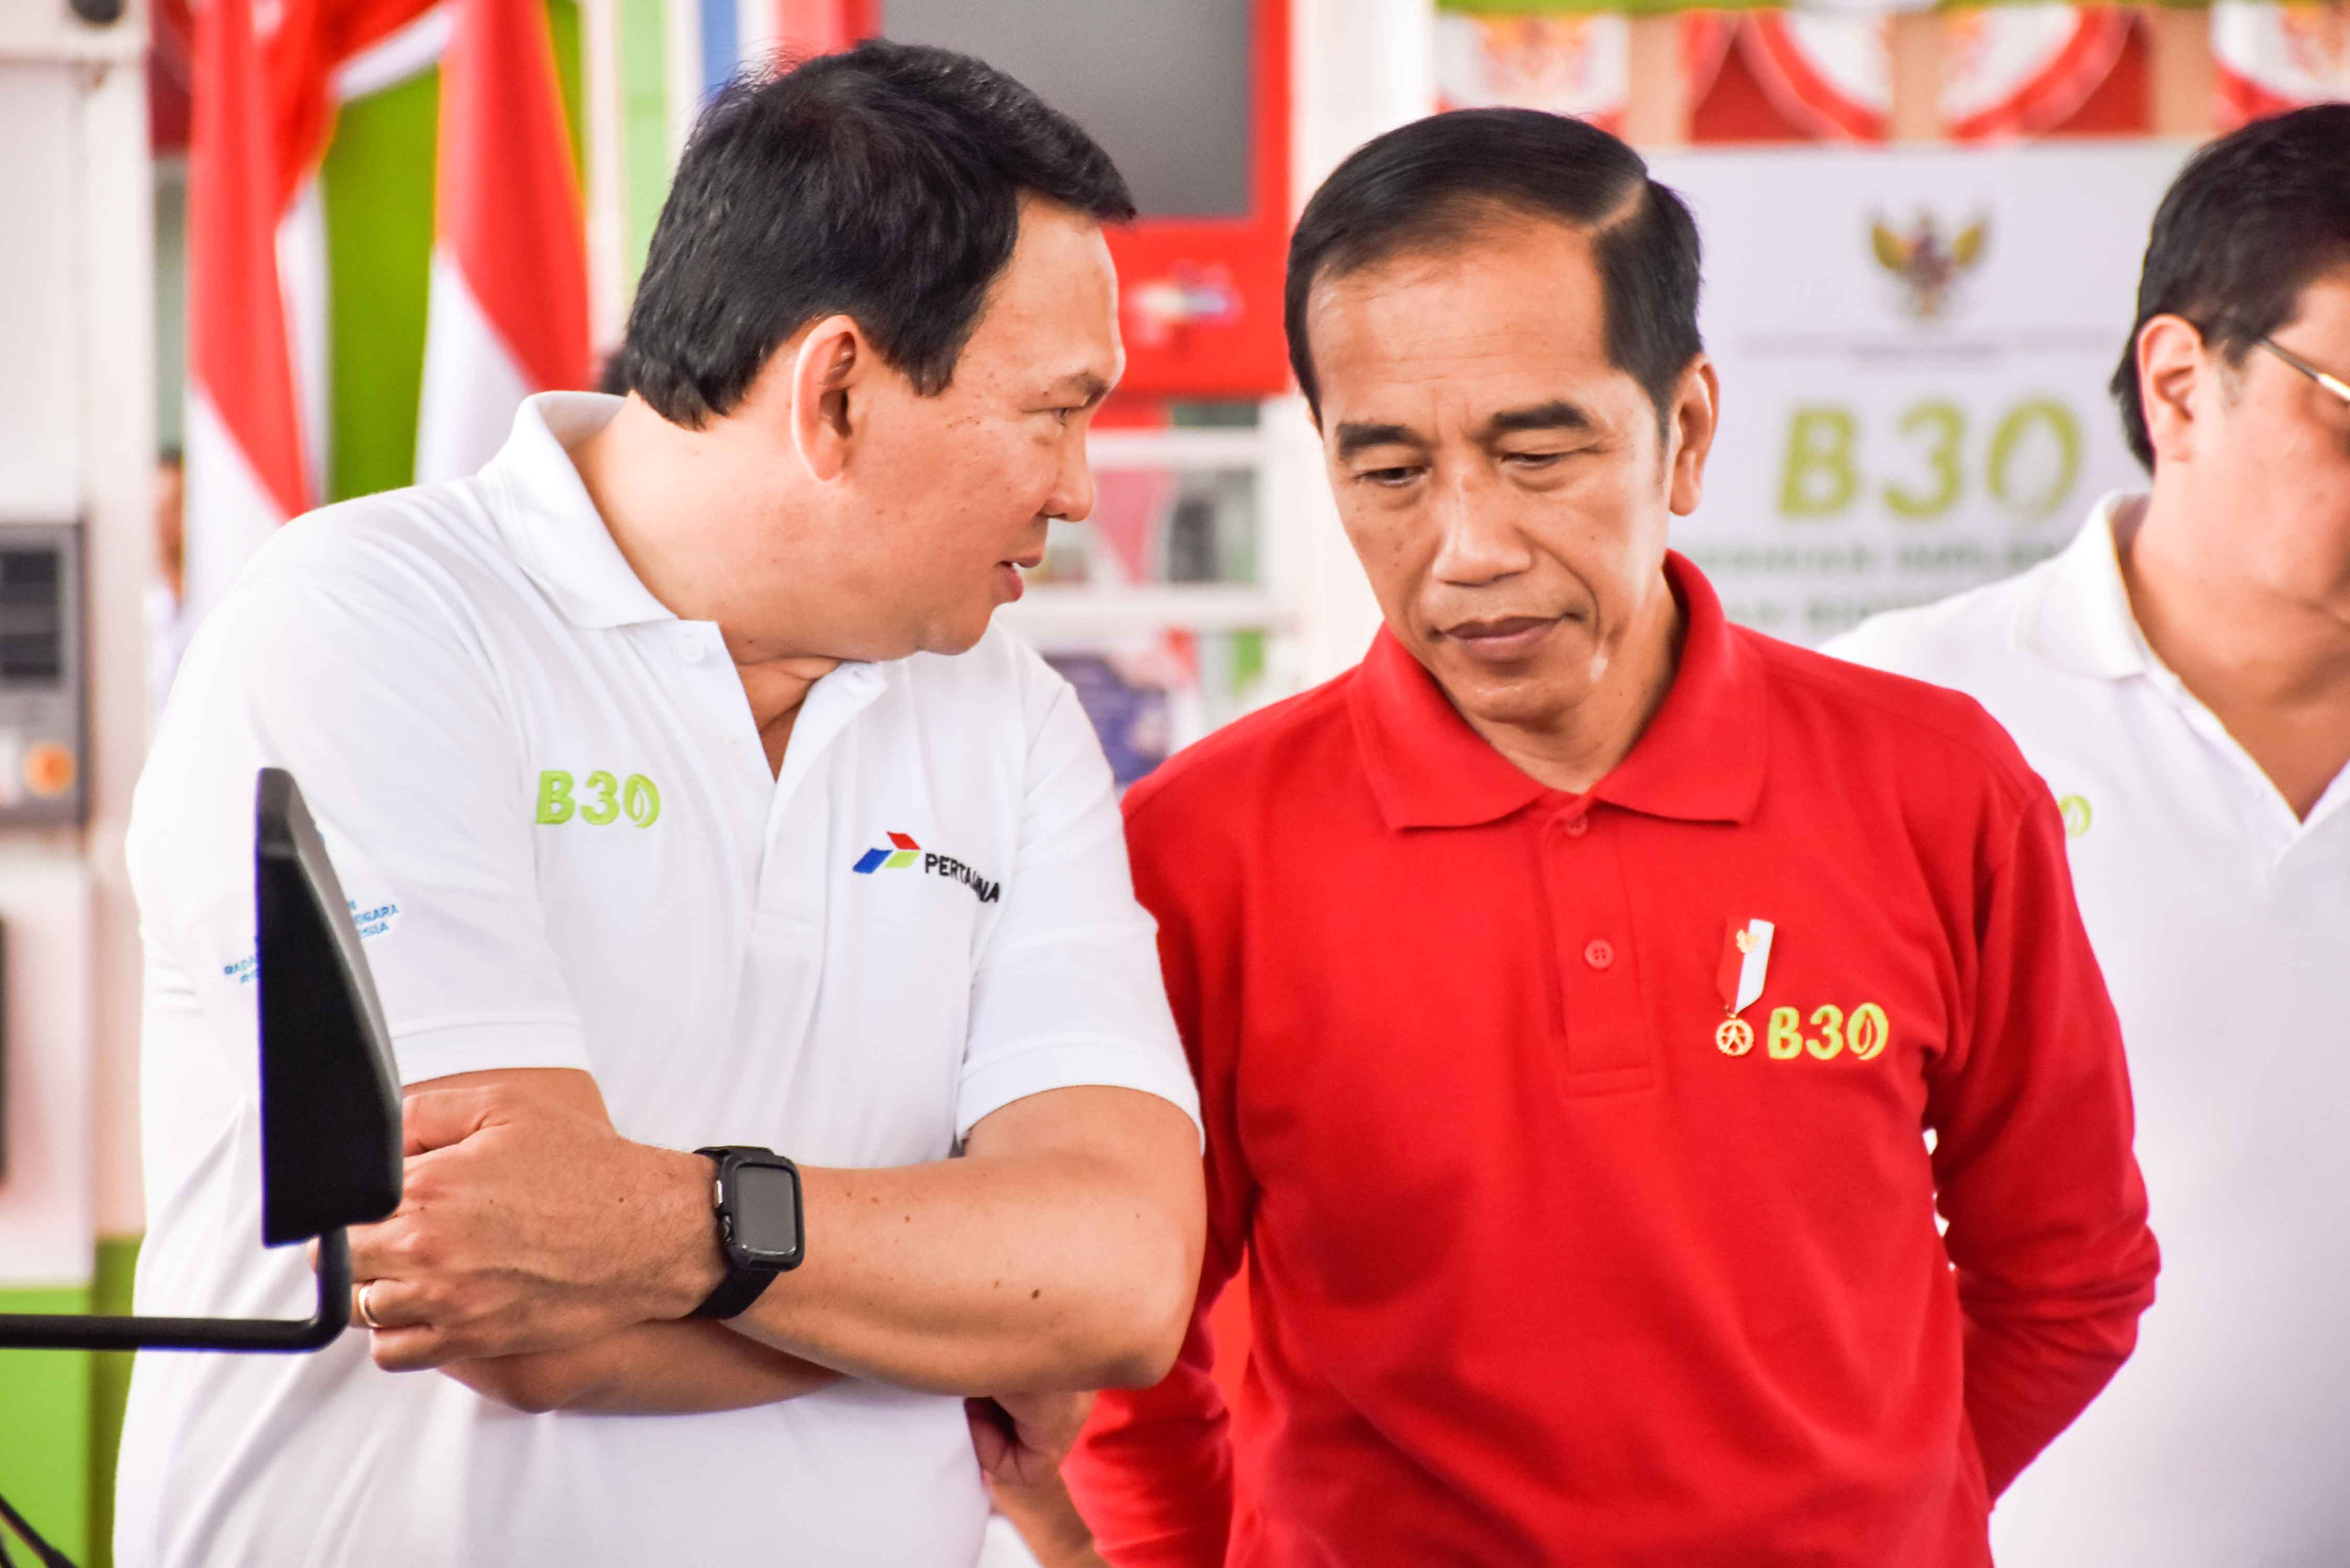 Presiden Indonesia Joko Widodo dan Komisaris Utama Pertamina Basuki Tjahaya Purnama pada peresmian implementasi program B30 di SPBU Pertamina Jalan MT Haryono Jakarta Selatan, Senin (23/12/2019).